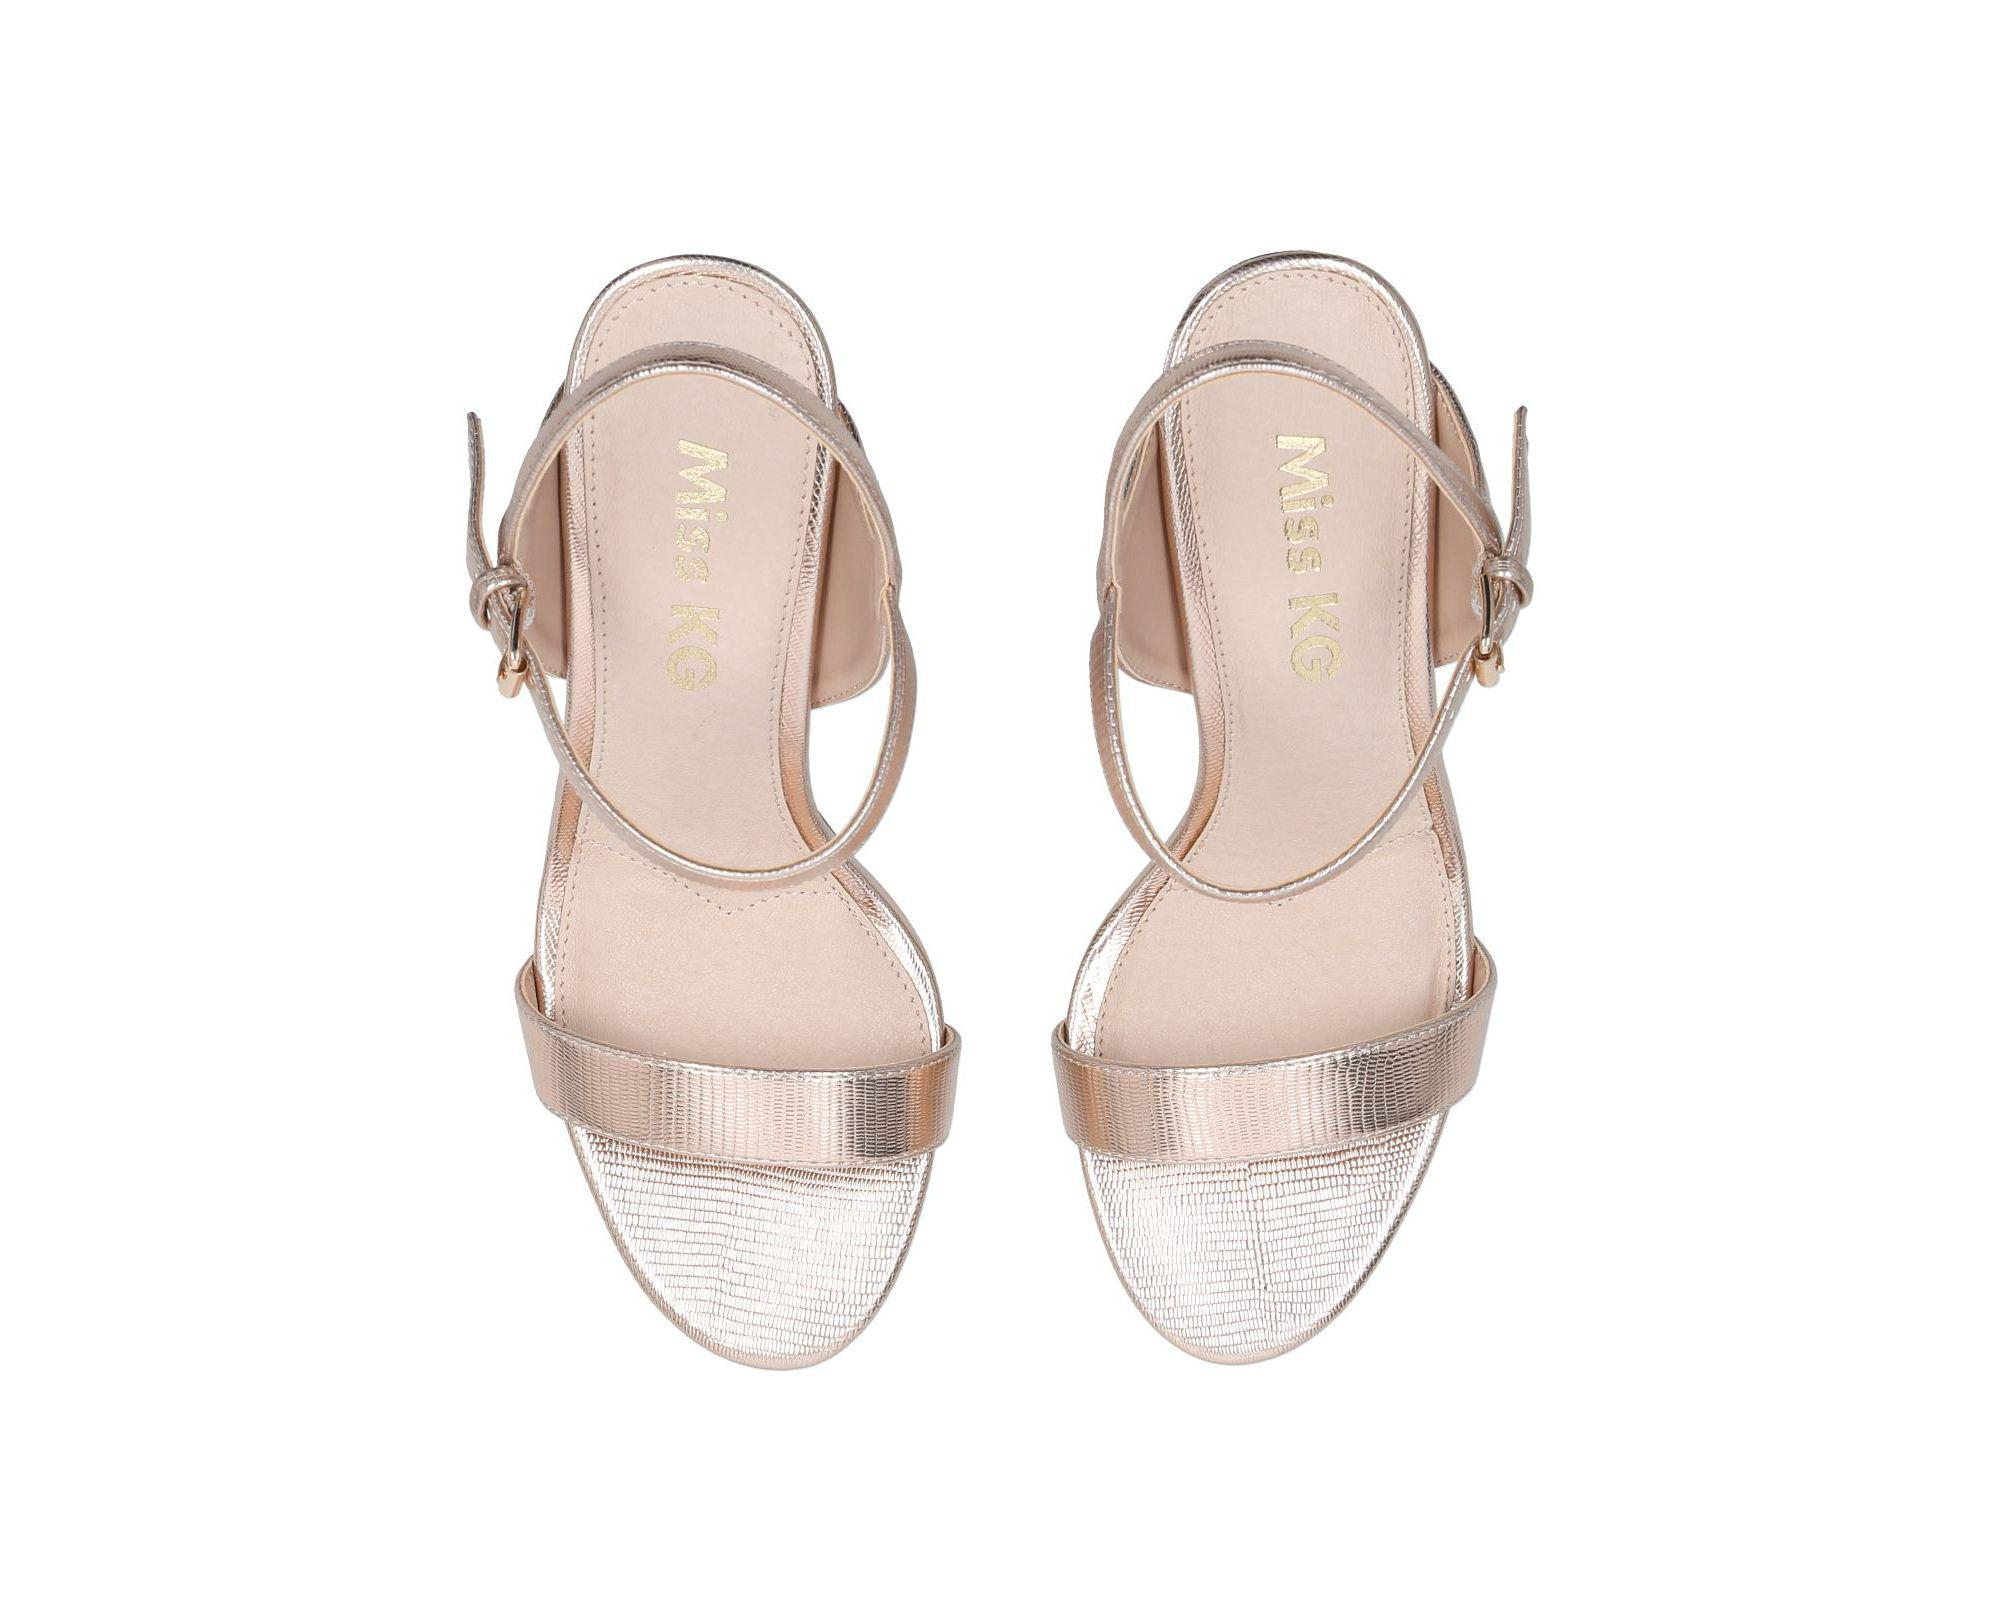 94ffb8a82e8 Miss Kg Rose  poppy  Gold Mid Heel Sandals in Metallic - Lyst